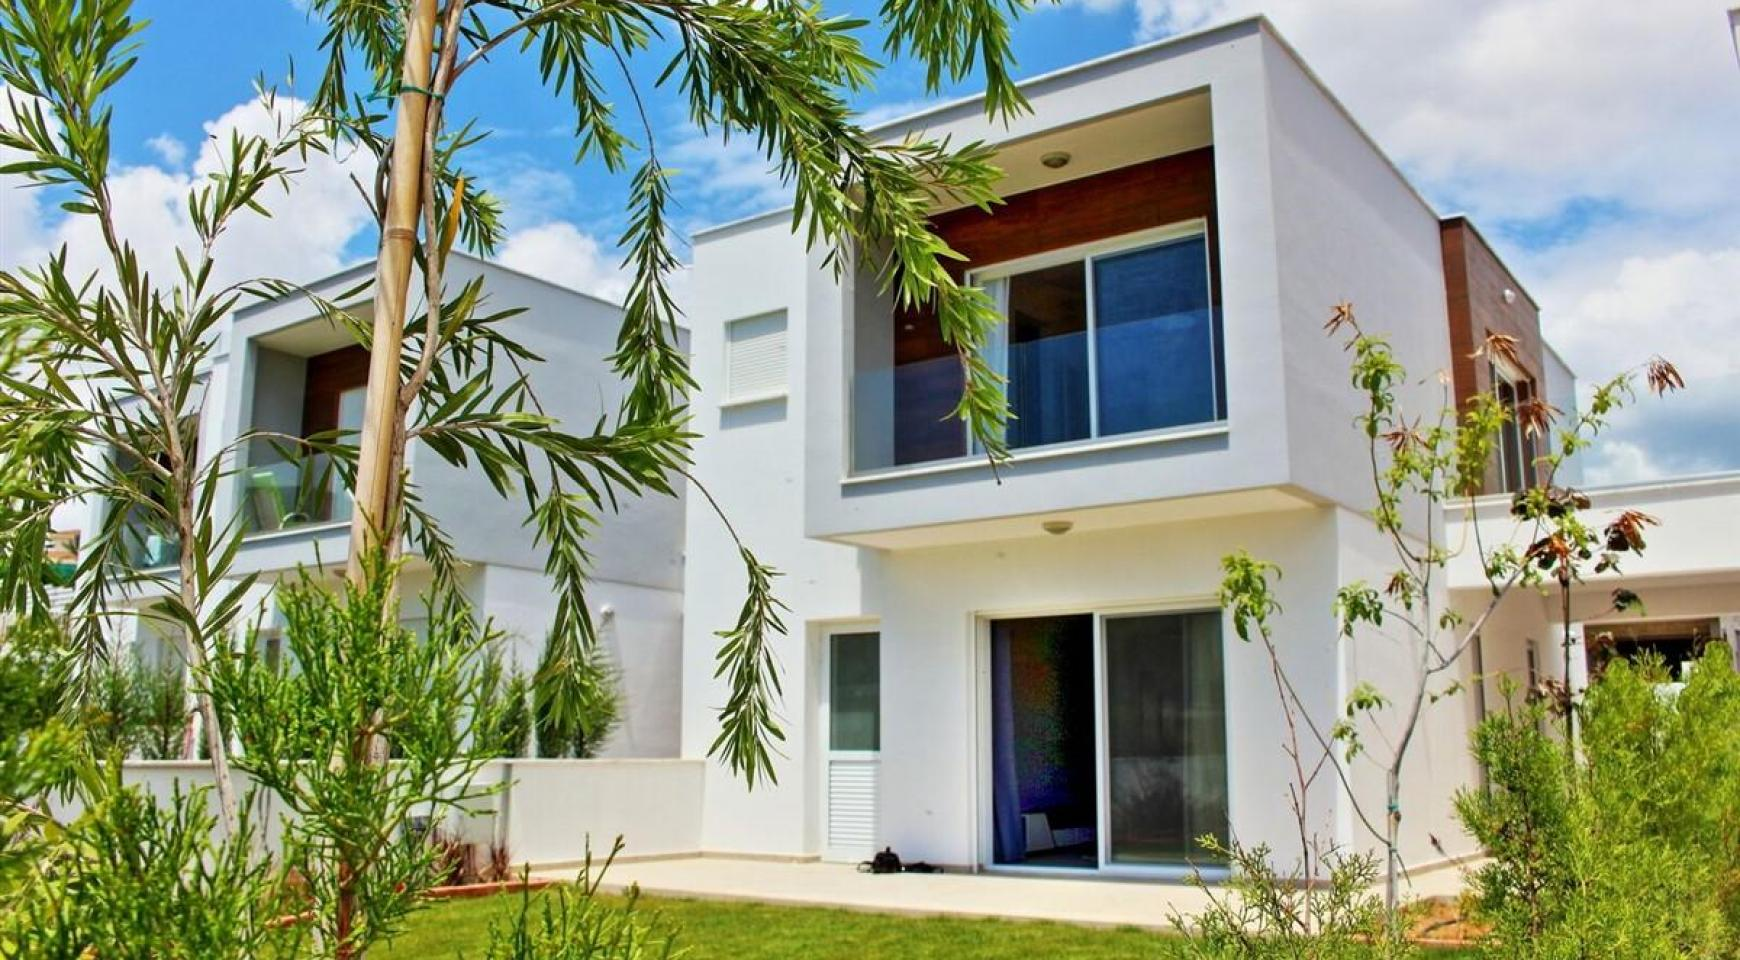 3 Bedroom Villa with Sea Views in Mouttagiaka - 2